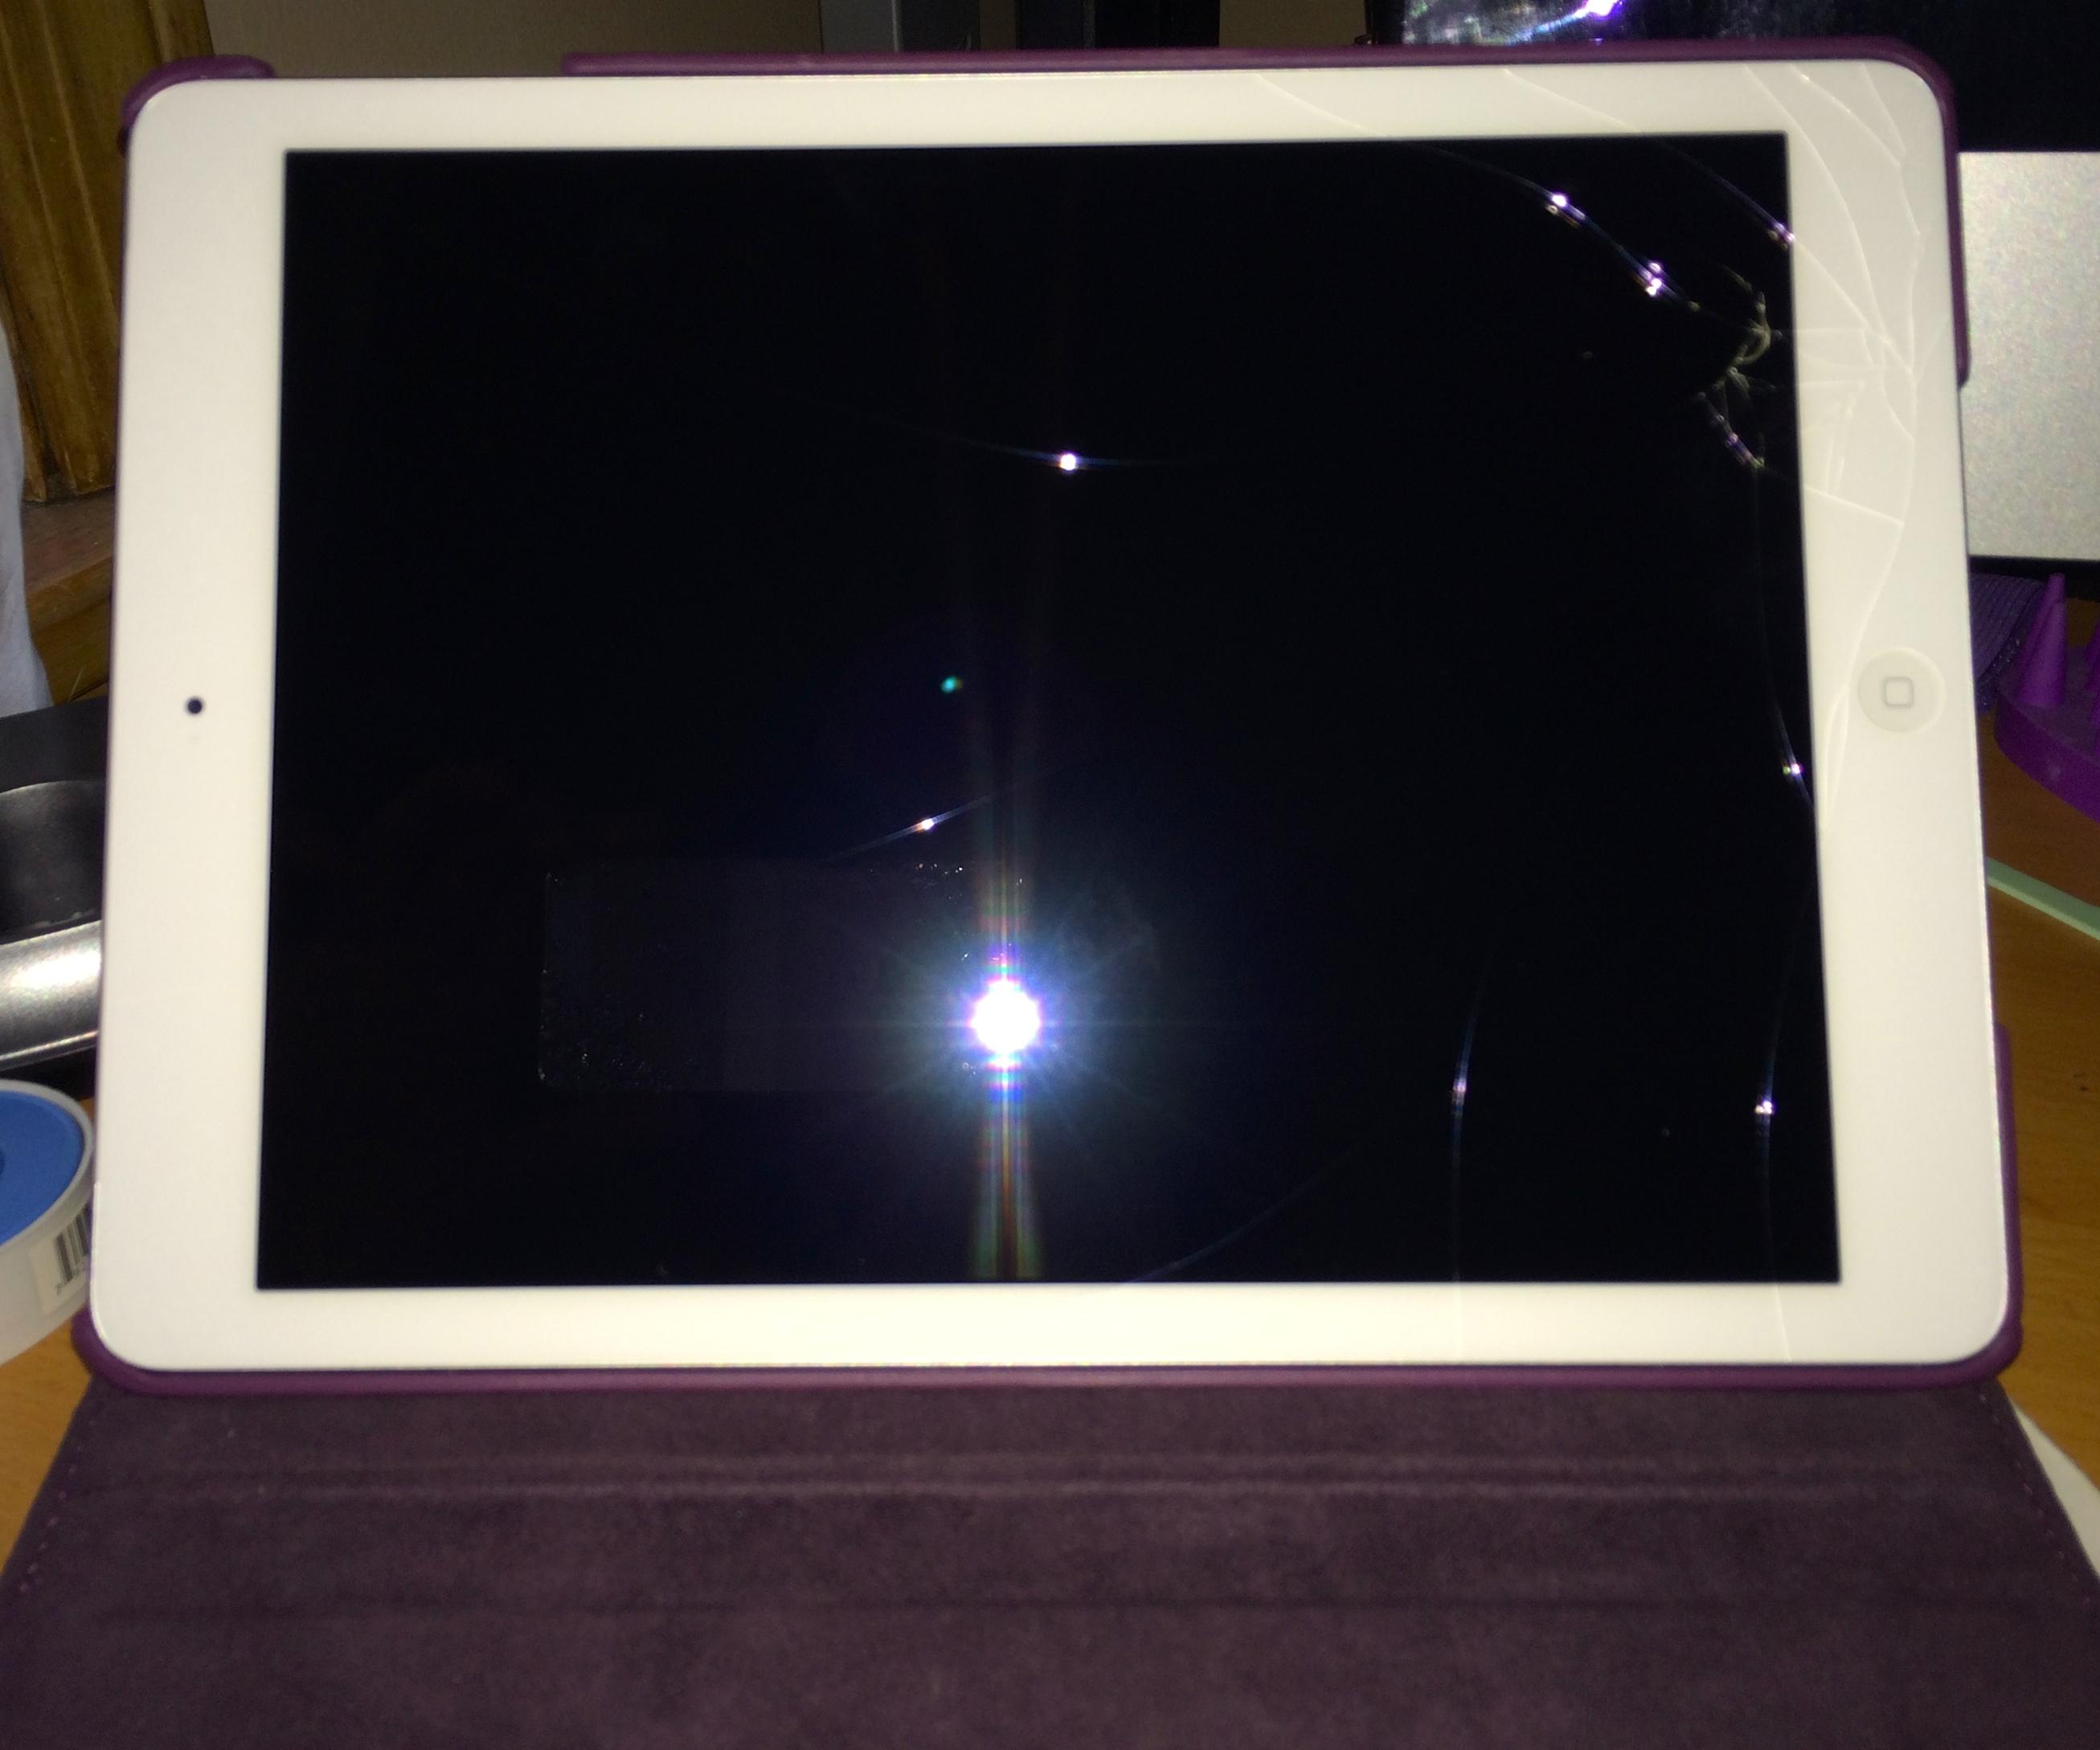 iPad Air glass break - Apple Community